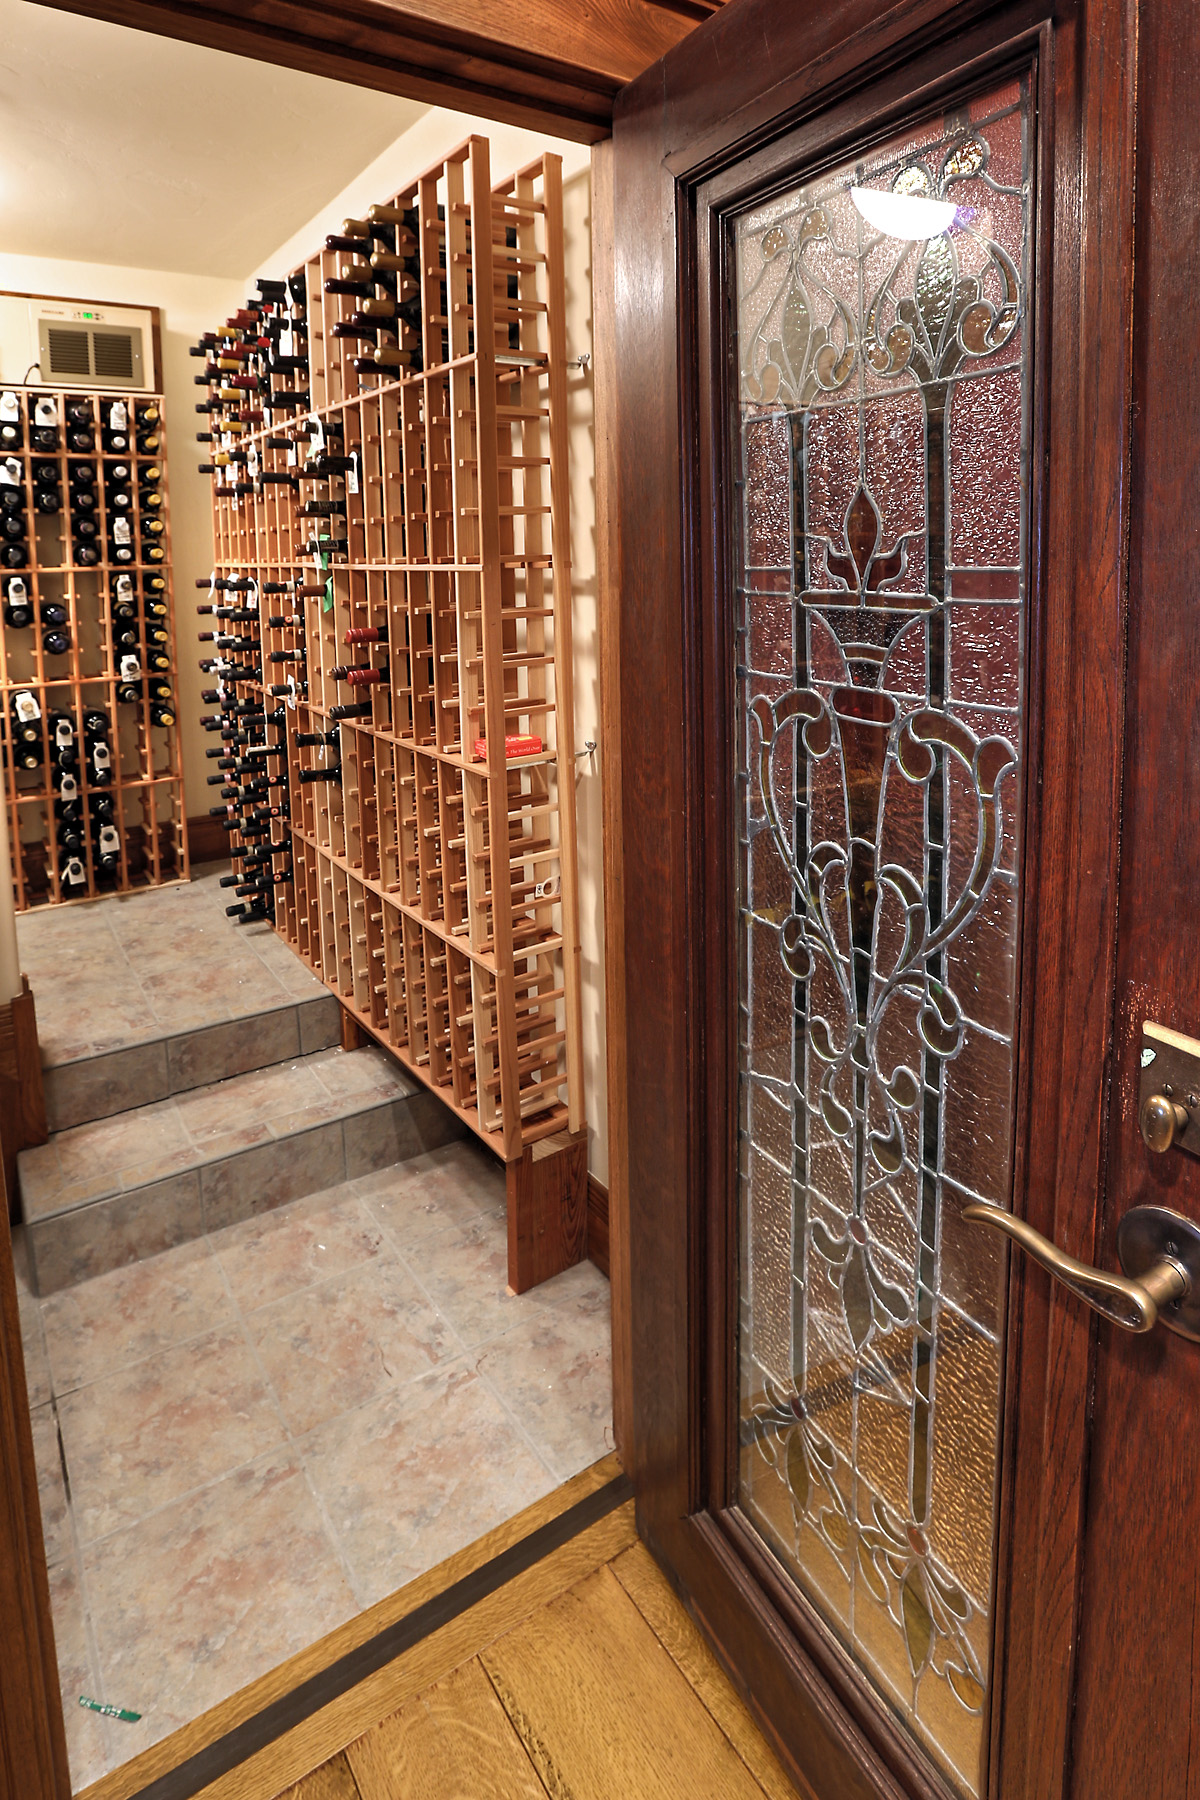 79 Hawley Wine Cellar